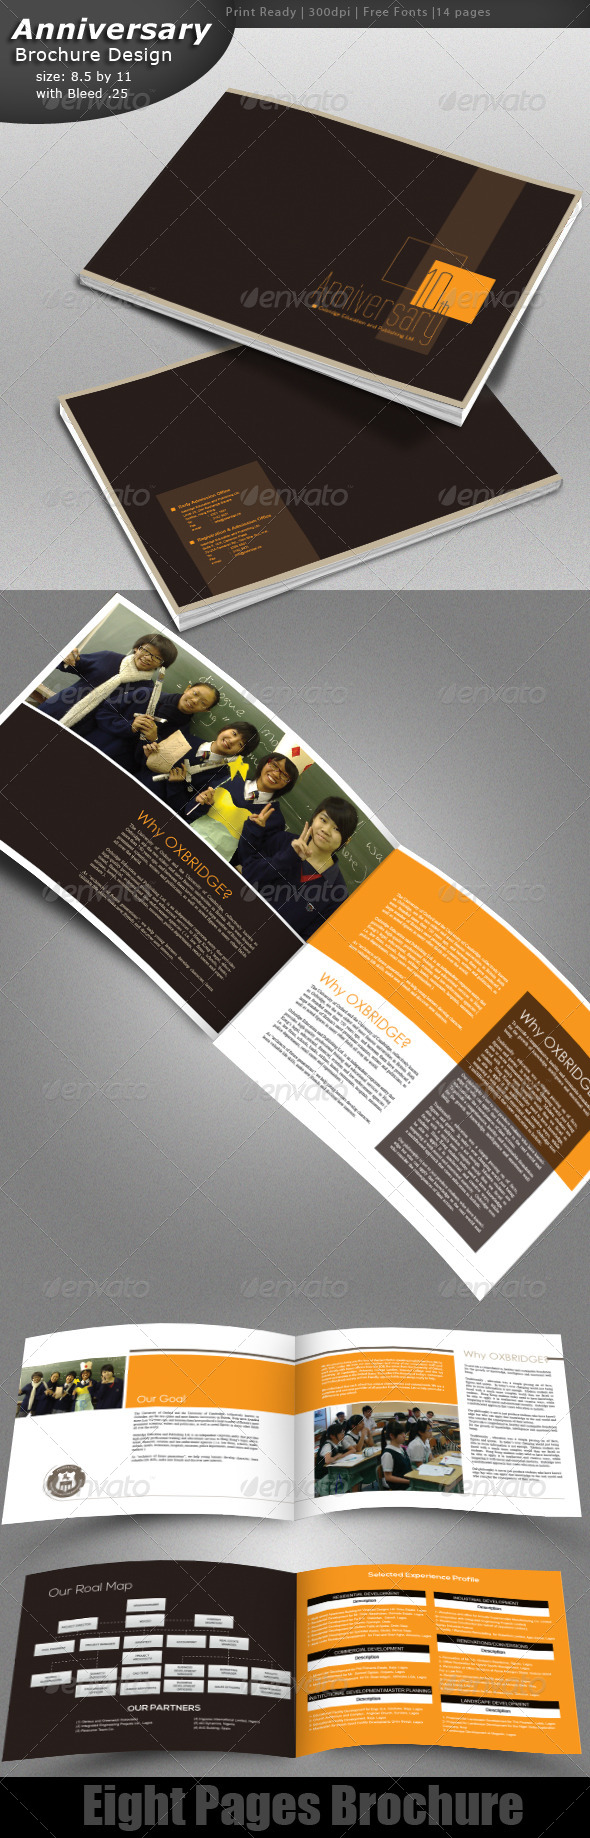 Anniversary Brochure Design  - Brochures Print Templates